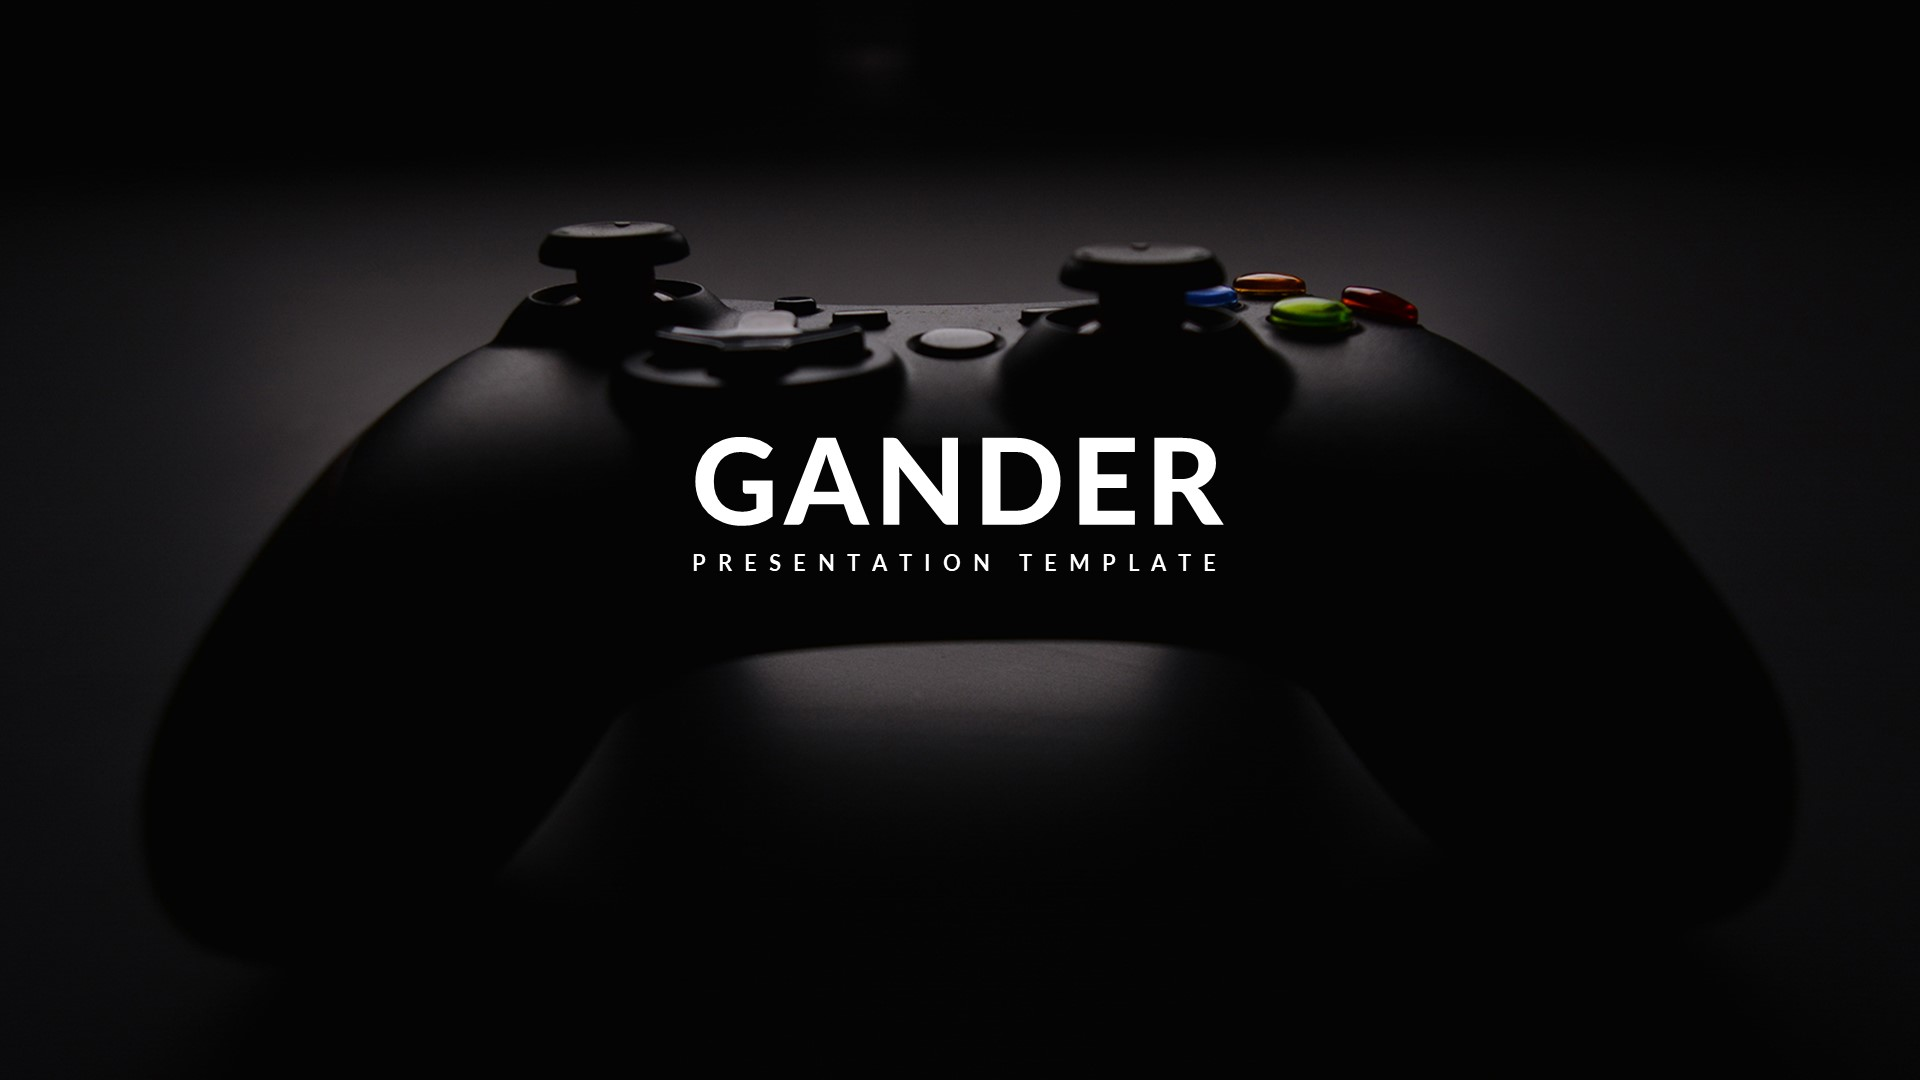 Gander creative powerpoint template by sphinxstudio graphicriver preview image setslide1 toneelgroepblik Choice Image